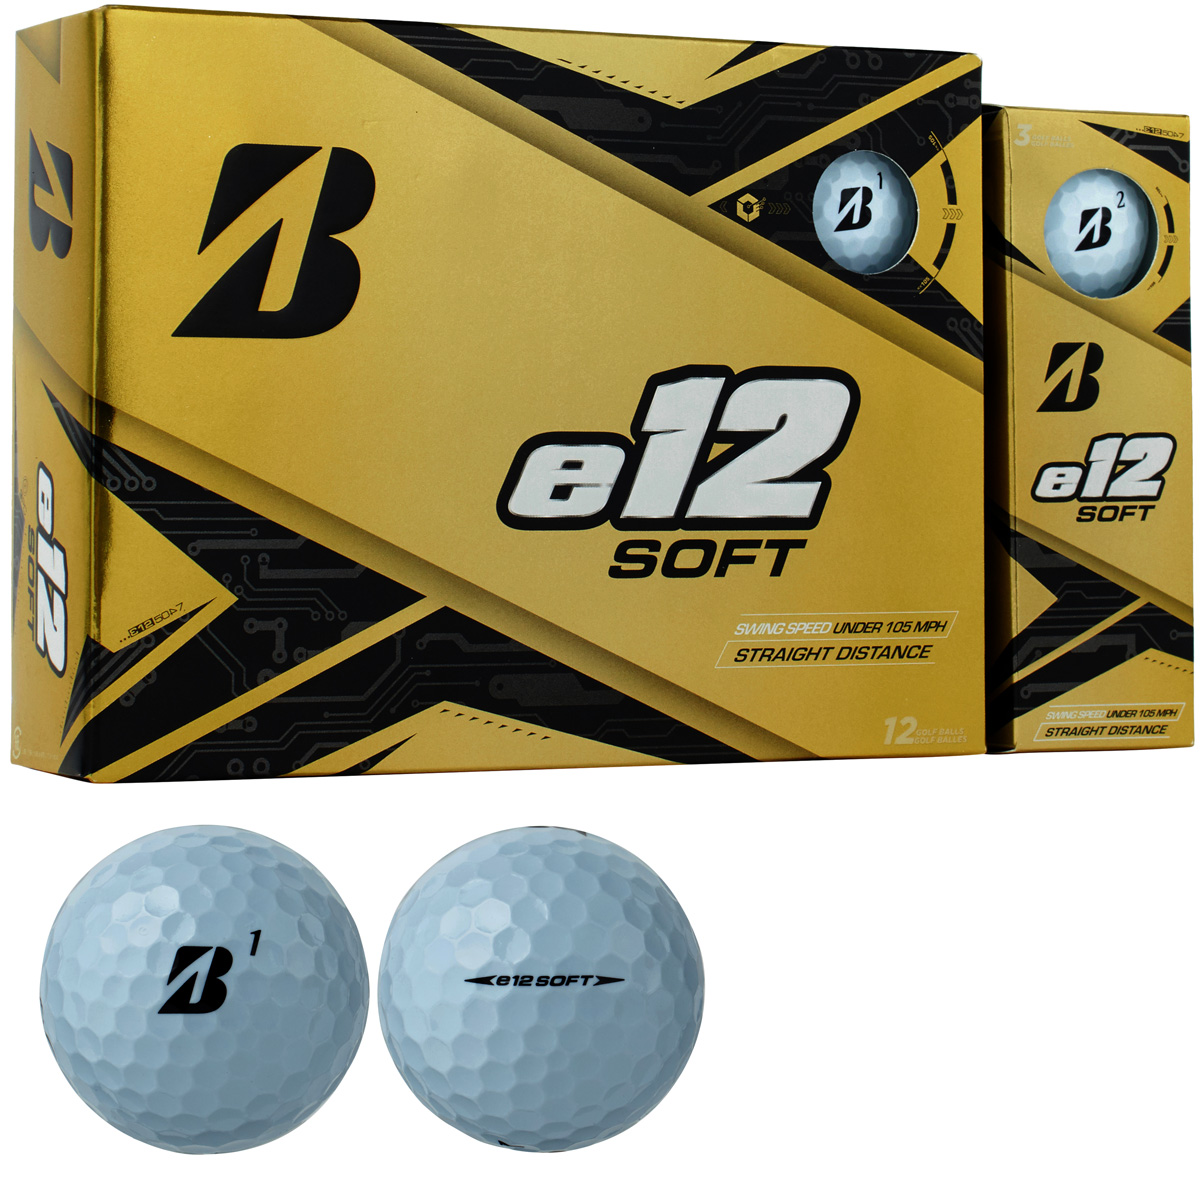 e12 SOFT ボール